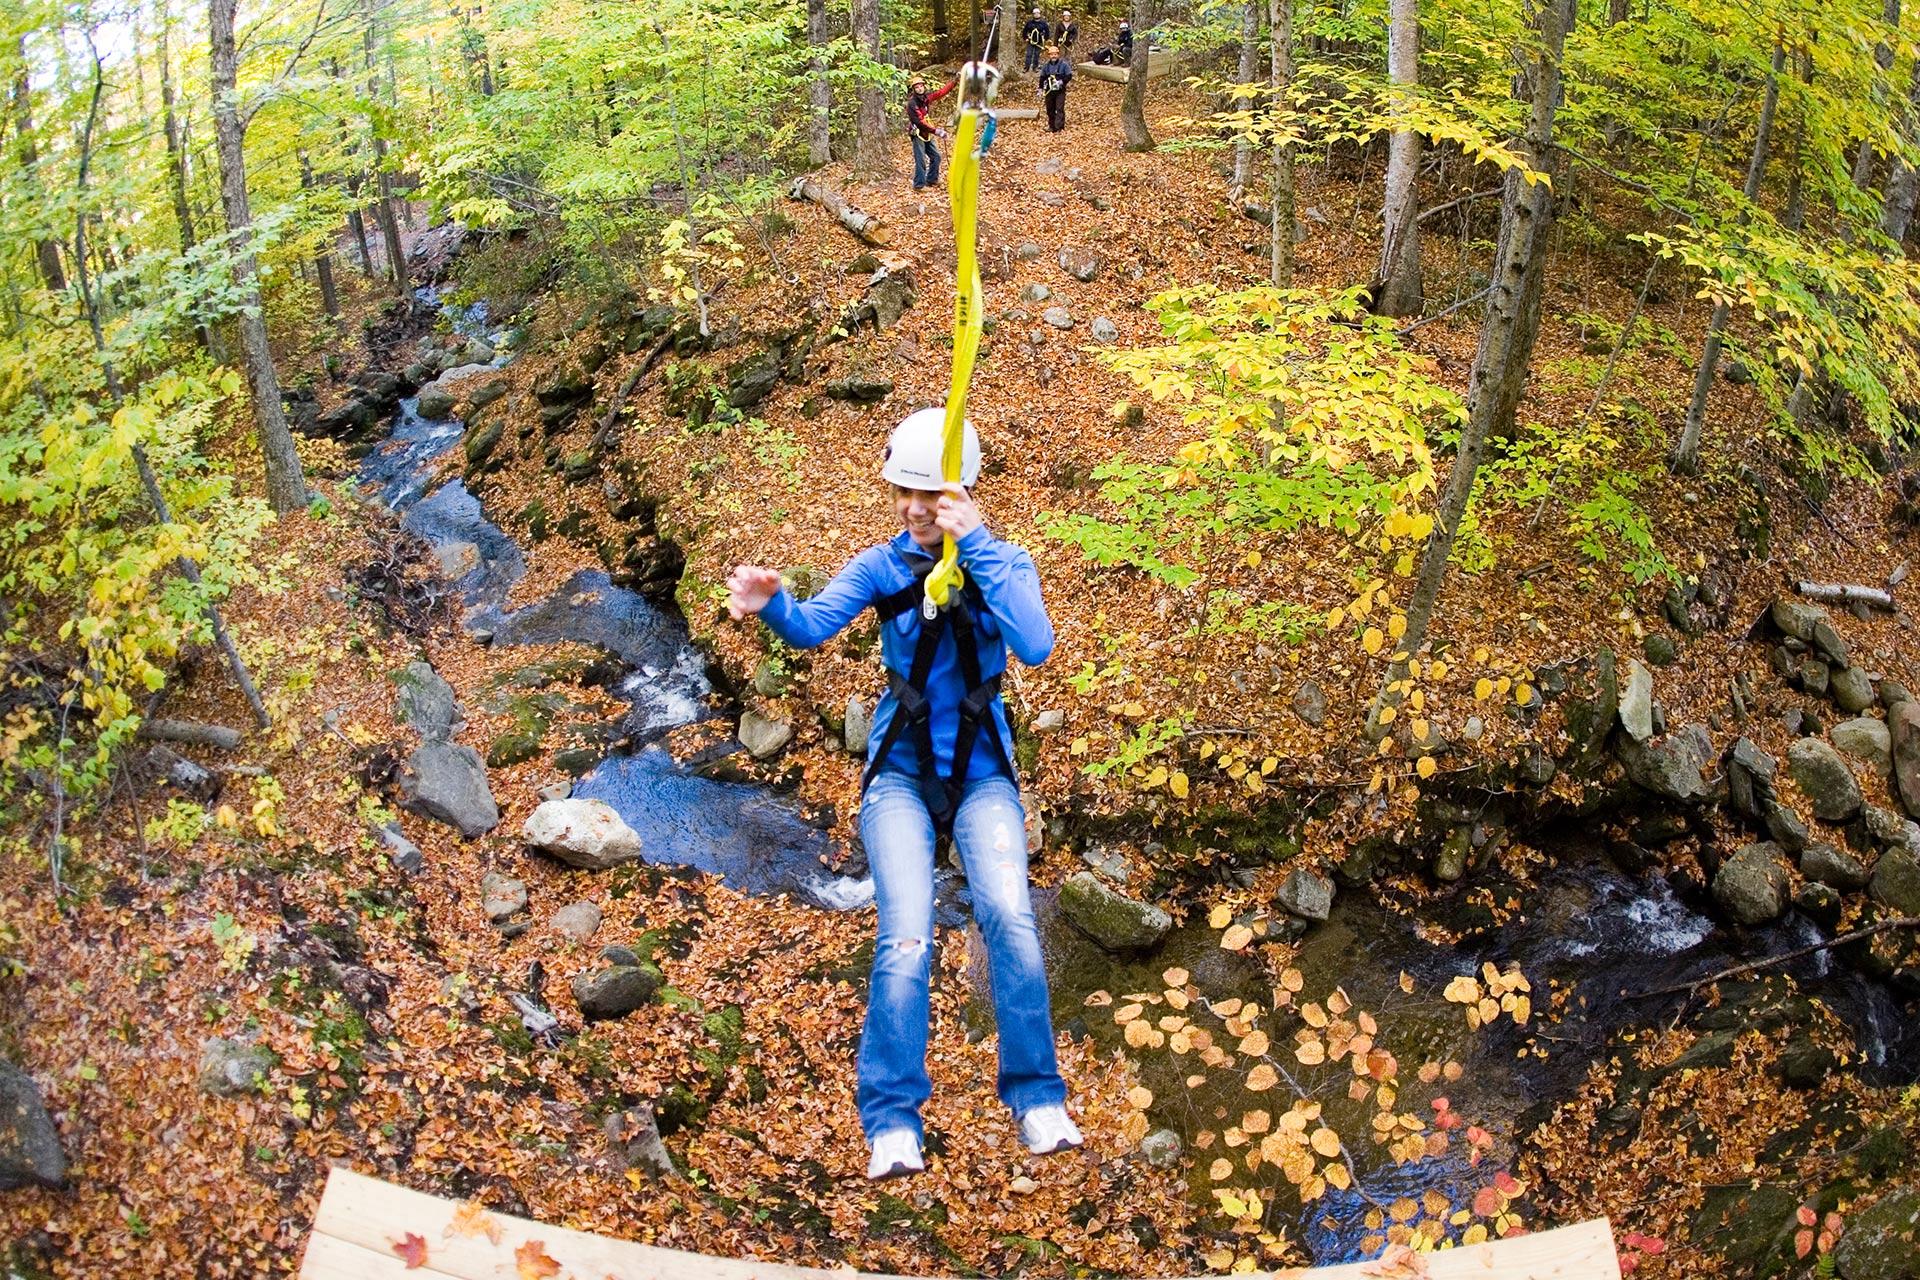 Ziplining at Sunday River Resort in Newry, Maine